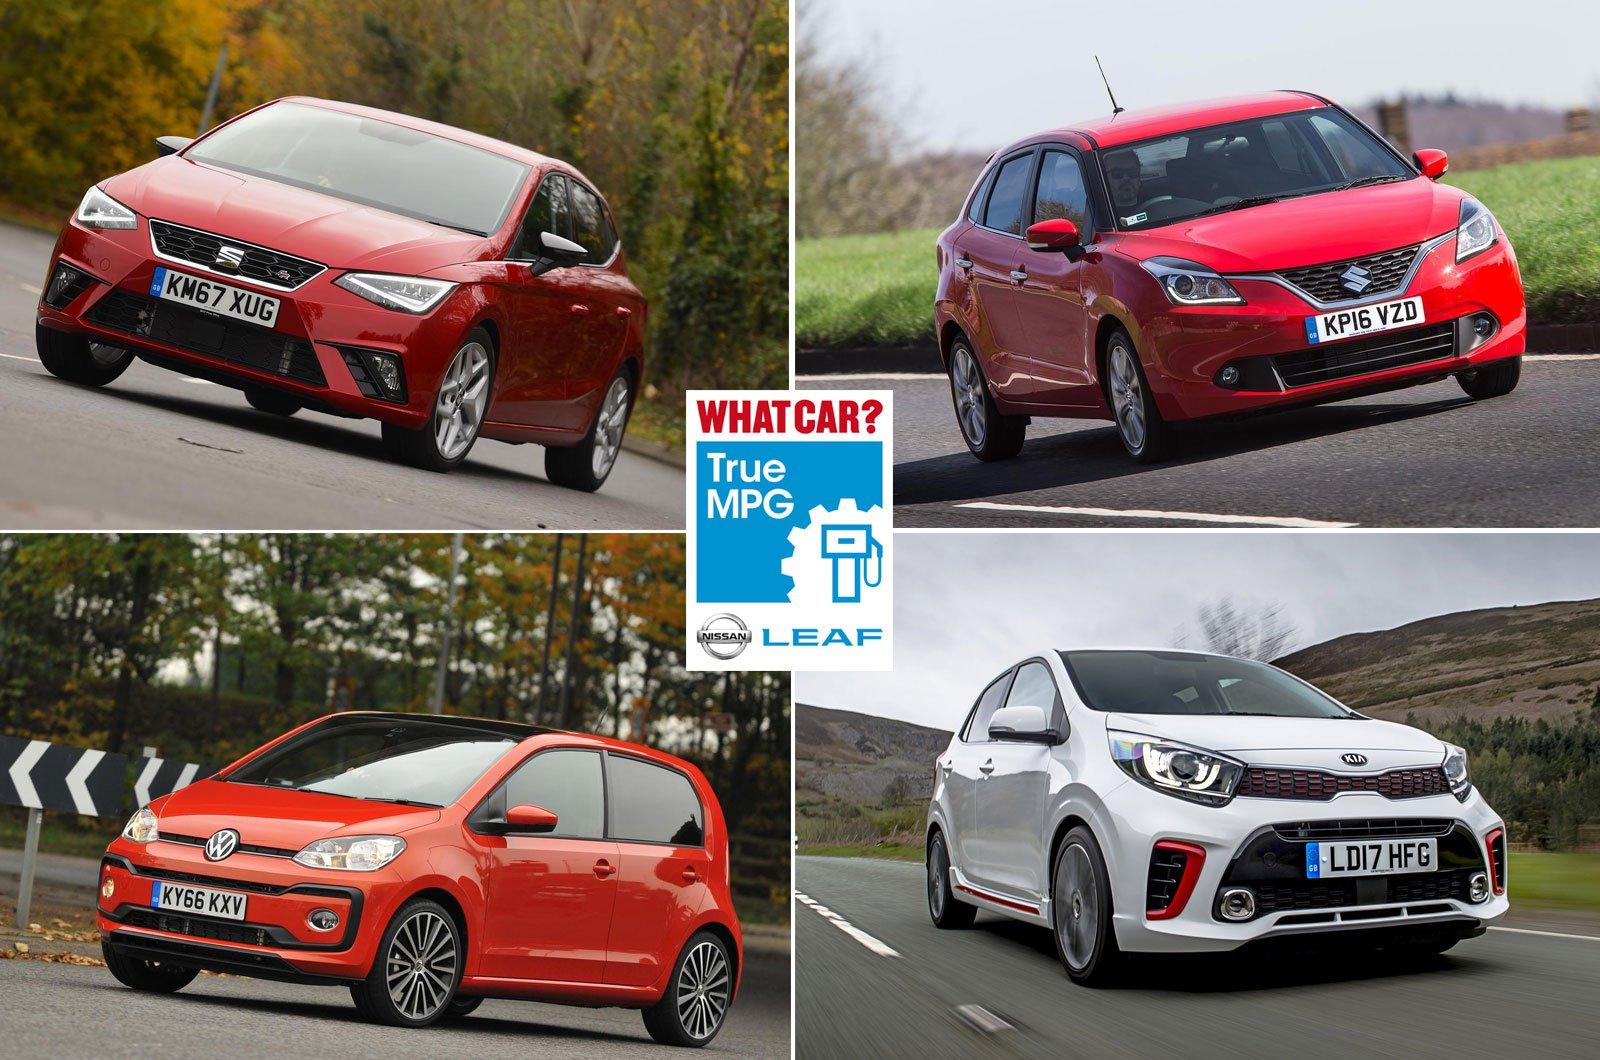 Seat Ibiza, Suzuki Baleno, Volkswagen Up, Kia Picanto